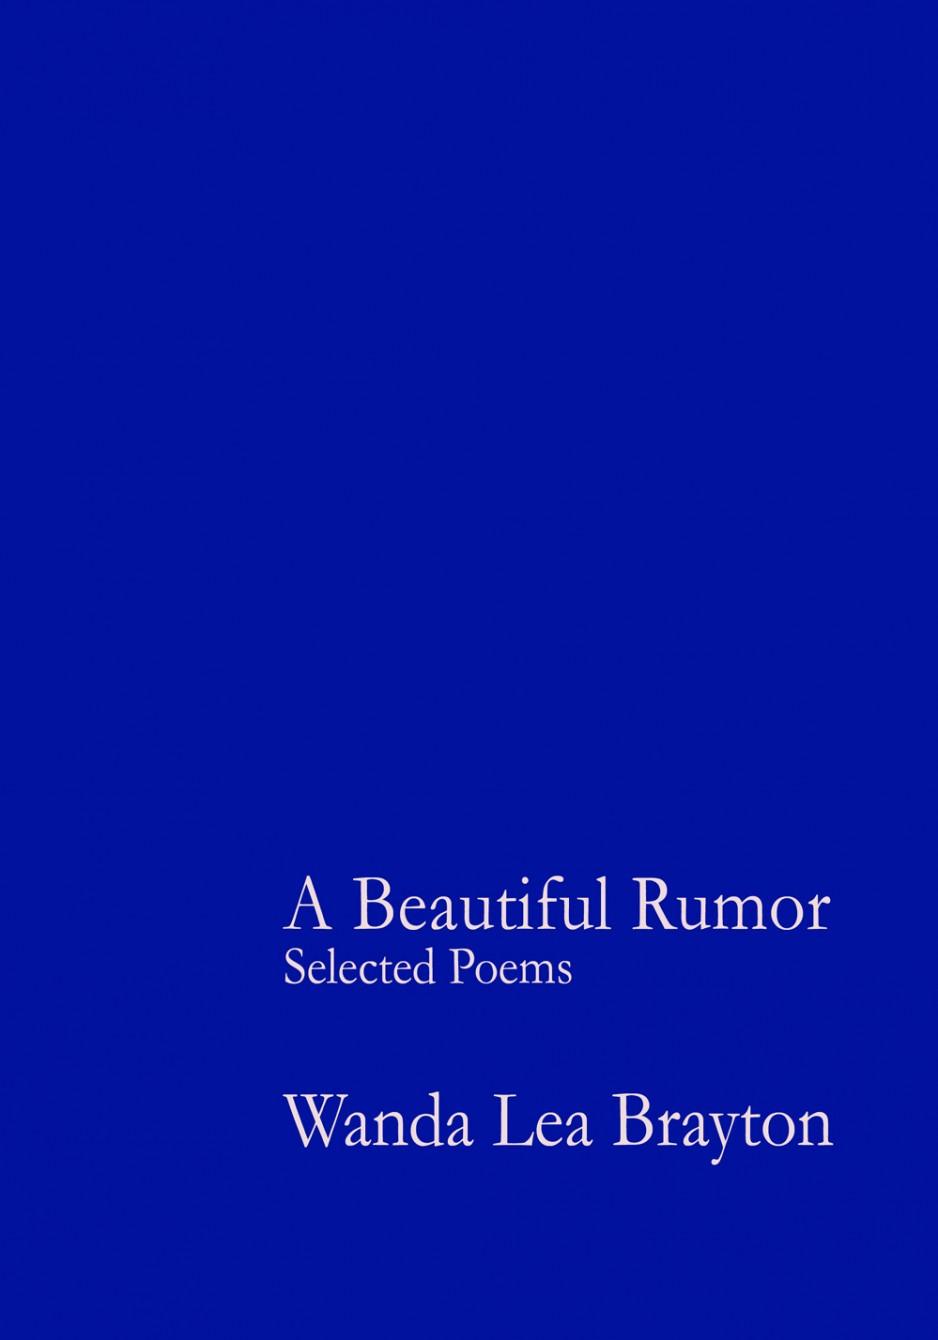 A Beautiful Rumor - Selected Poems